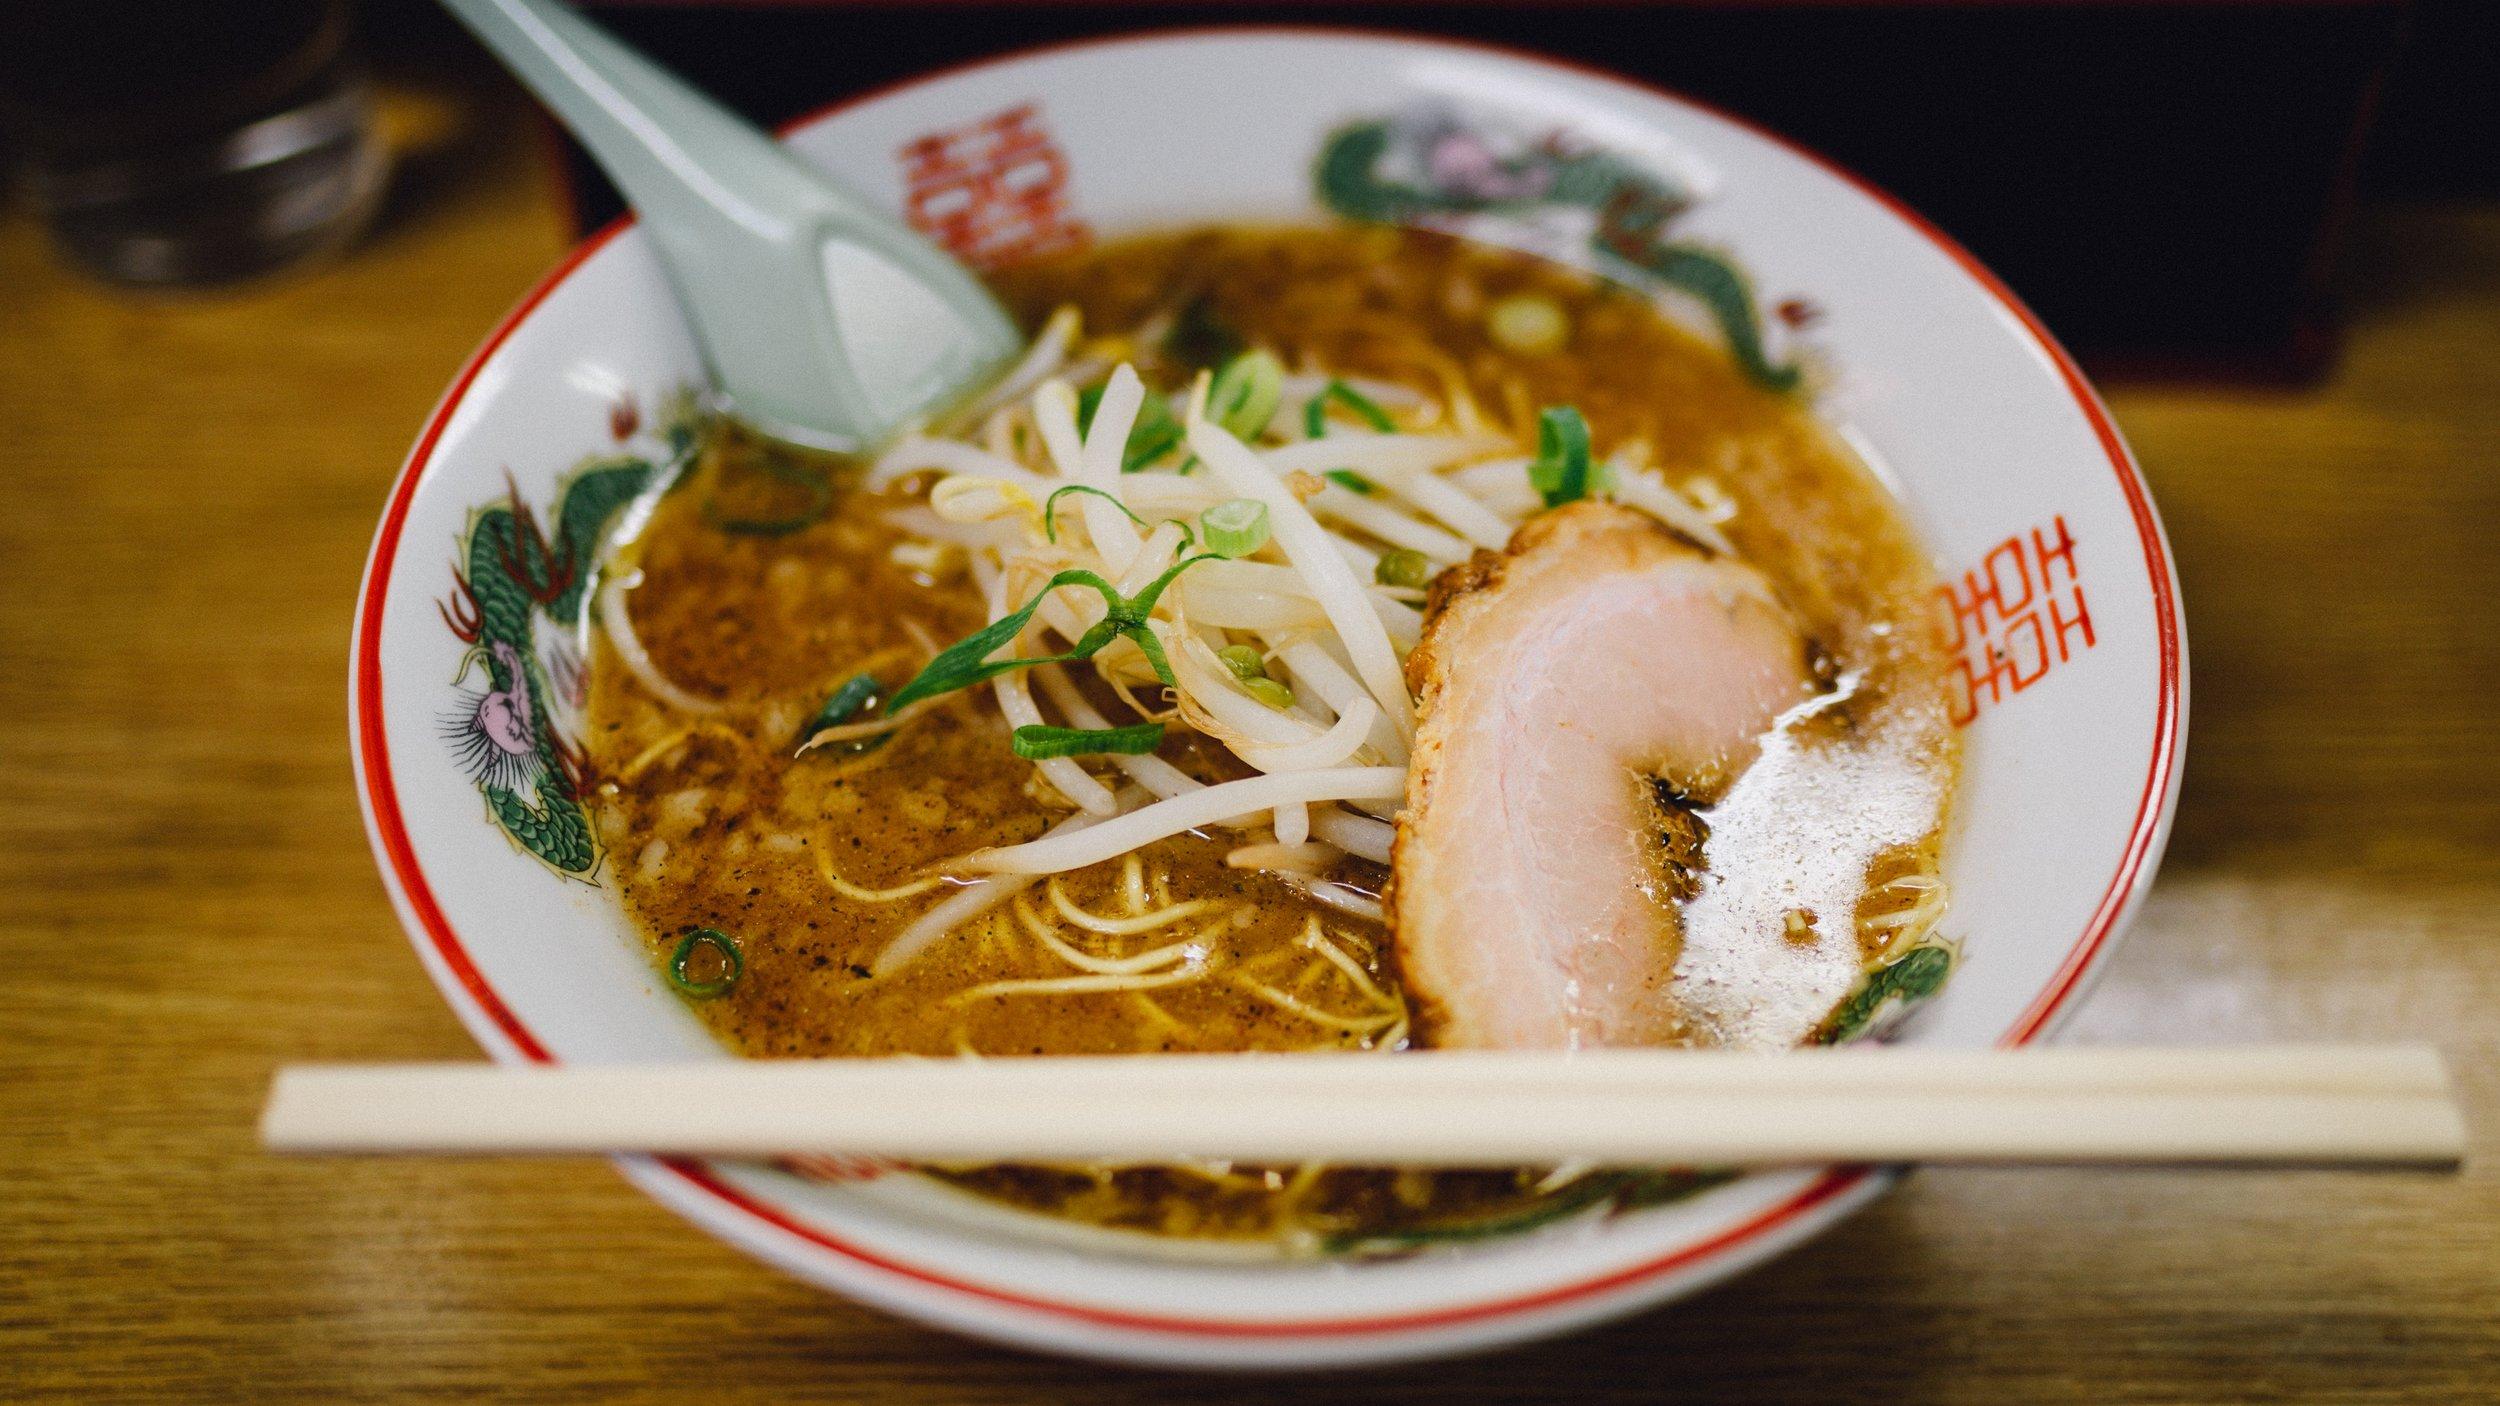 masaaki-komori-566381-unsplash.jpg